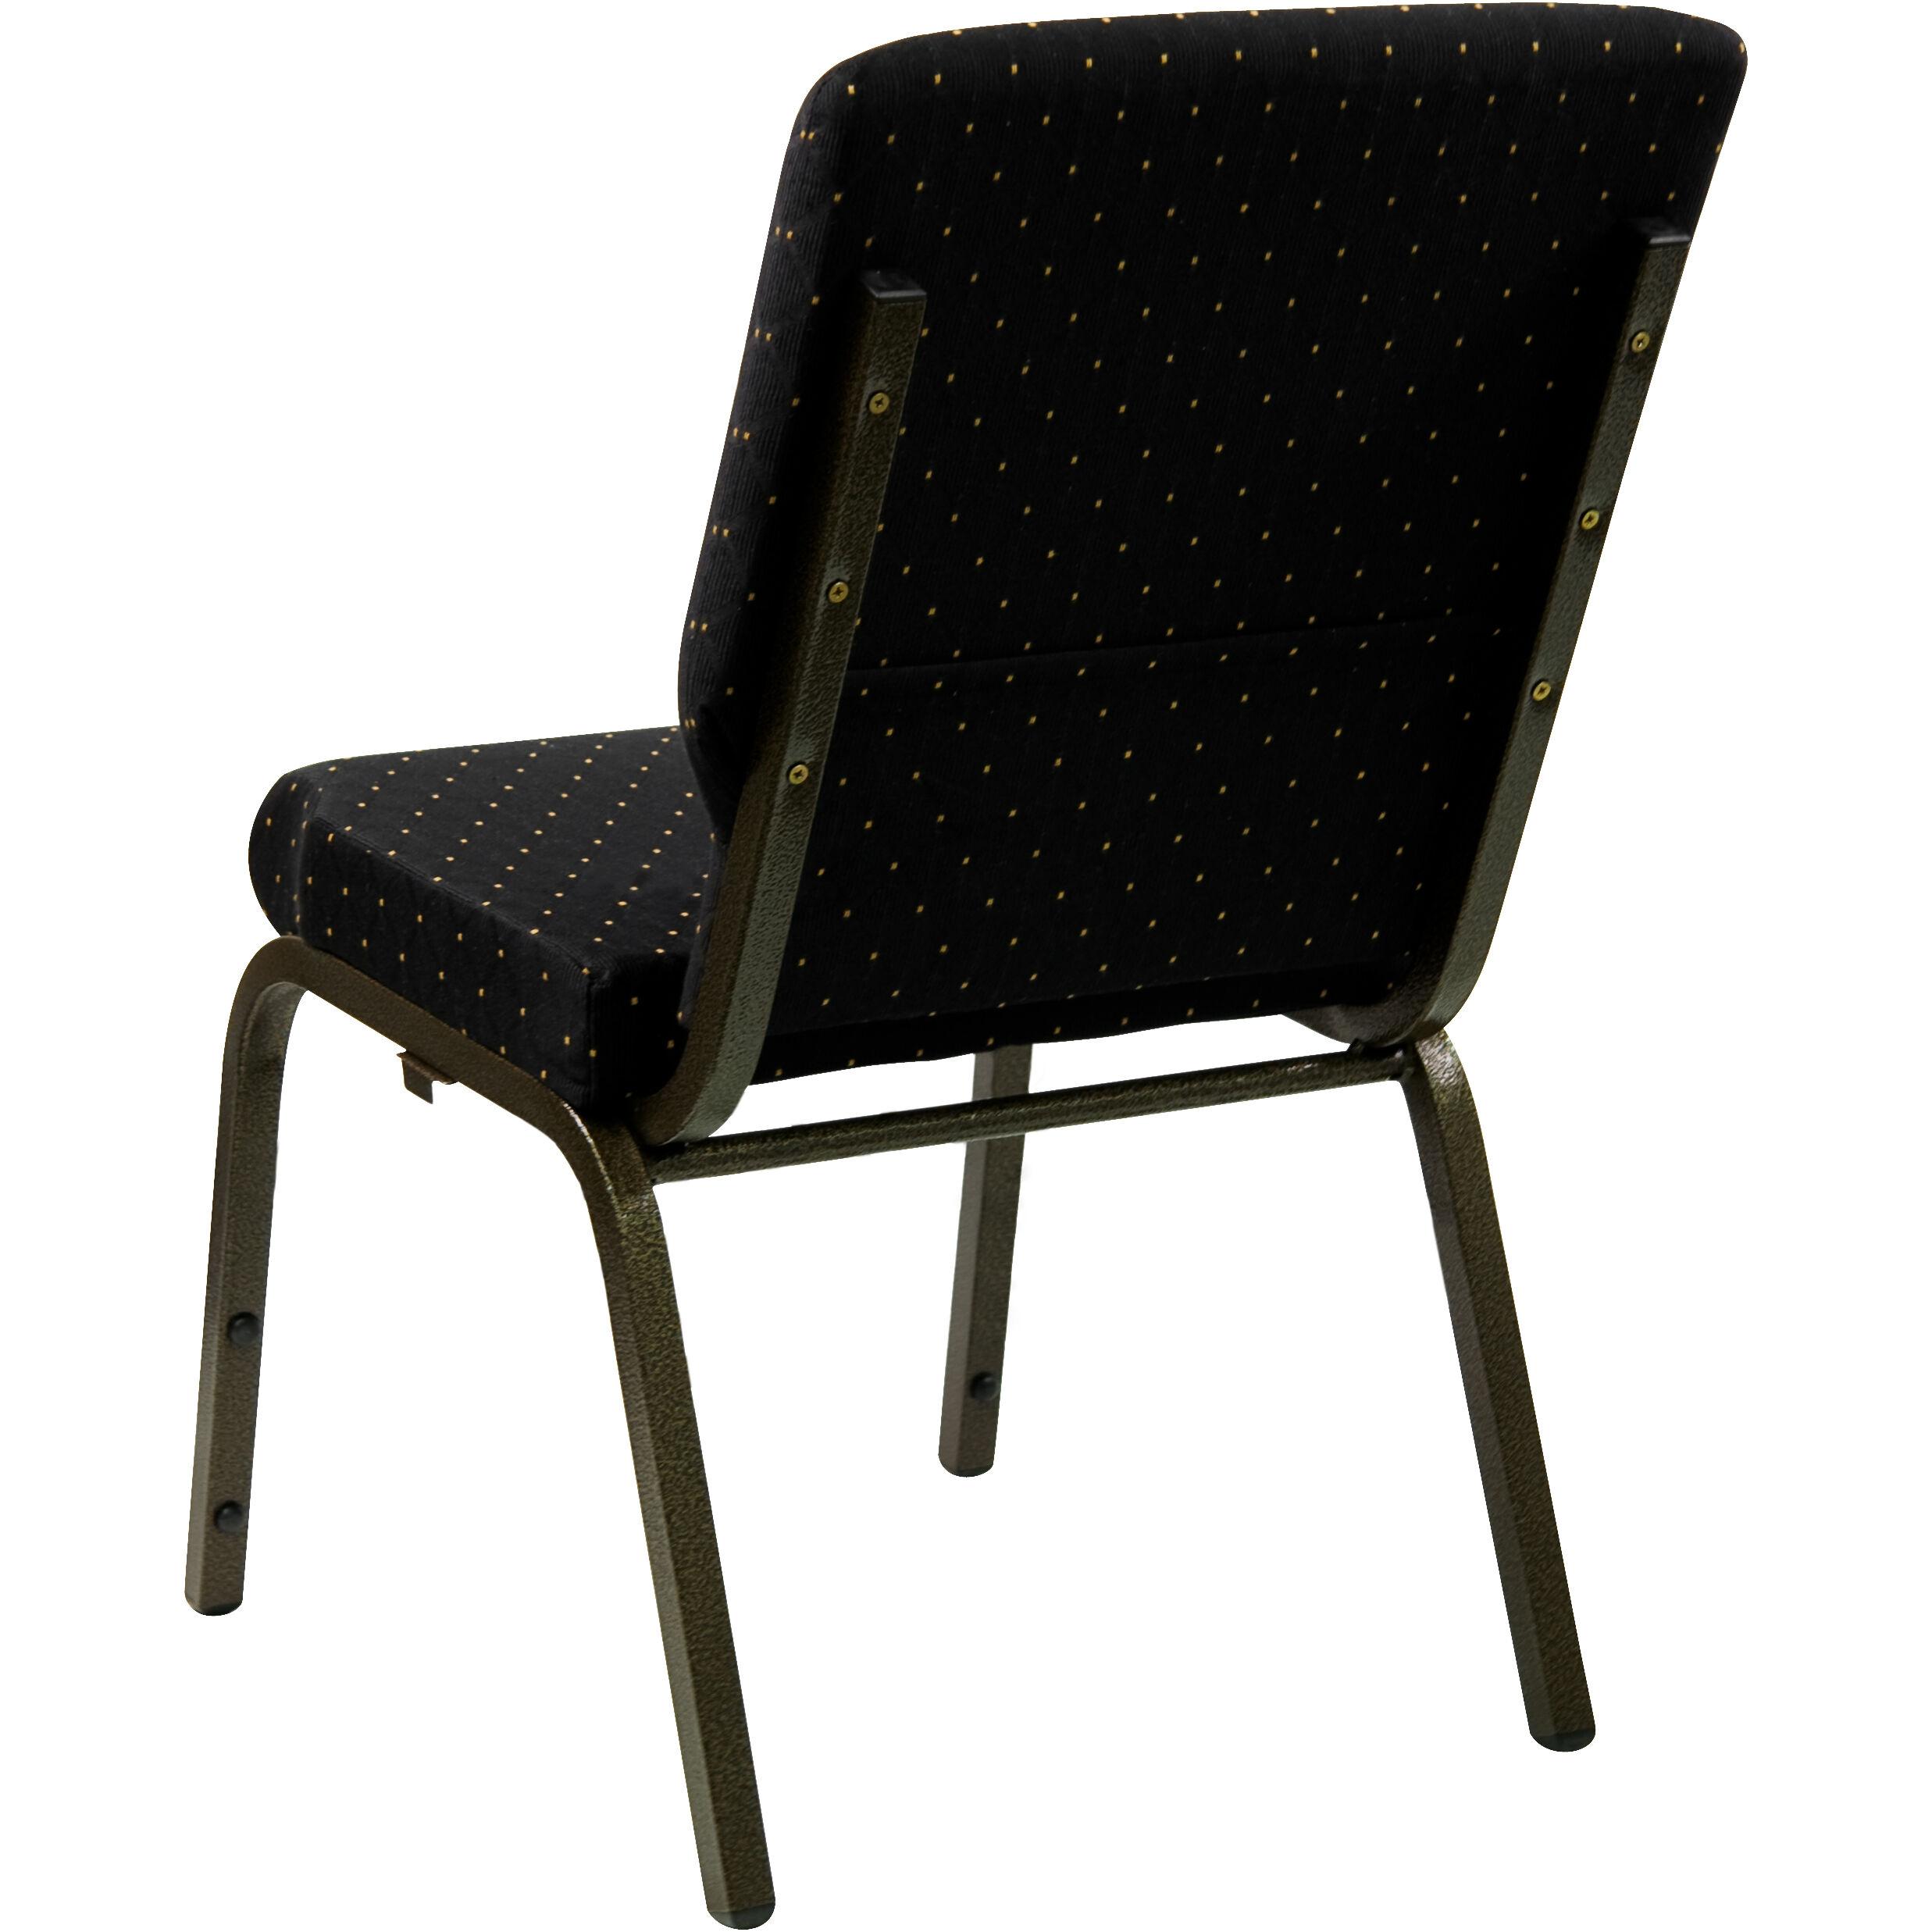 Wonderful Flash Furniture HERCULES Series 18.5u0027u0027W Stacking Church Chair In Black Dot  Patterned Fabric   Gold Vein Frame XU CH 60096 BK GG | StackChairs4Less.com